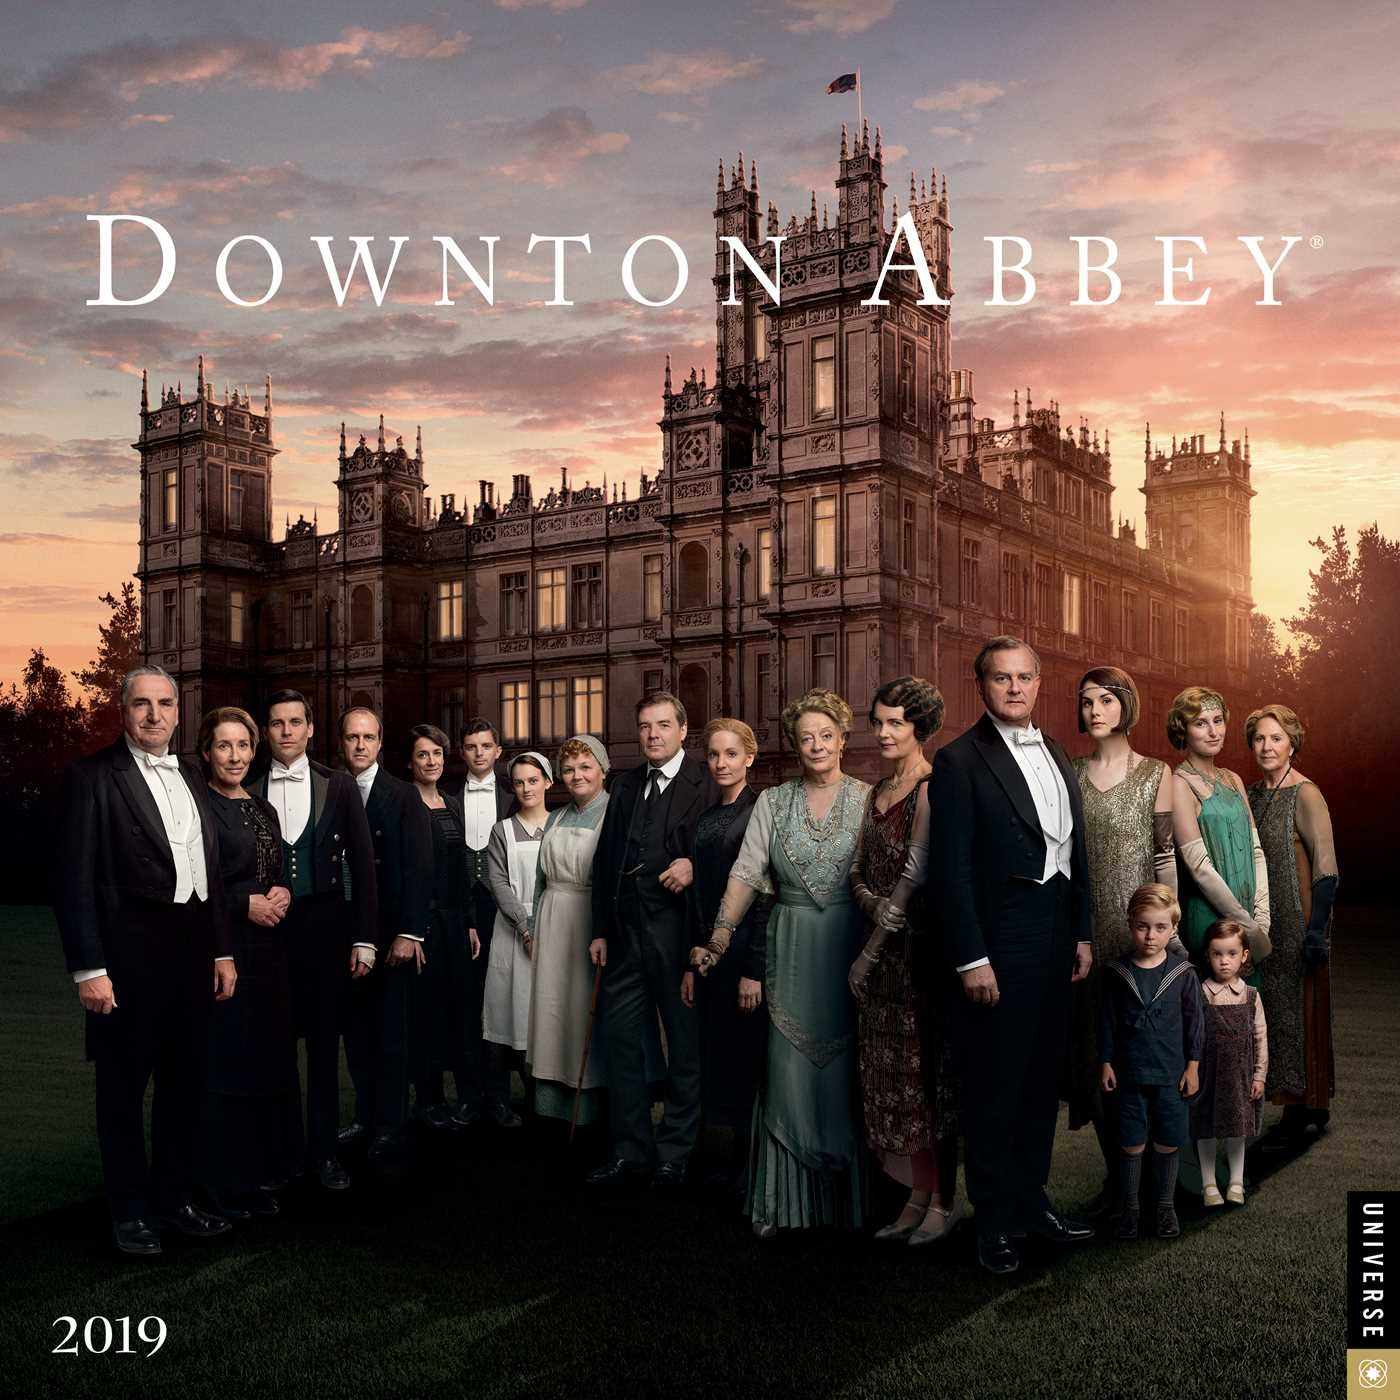 Downton Abbey 2019 Wall Calendar Nbc Universal 0676728034902 Amazon Com Books